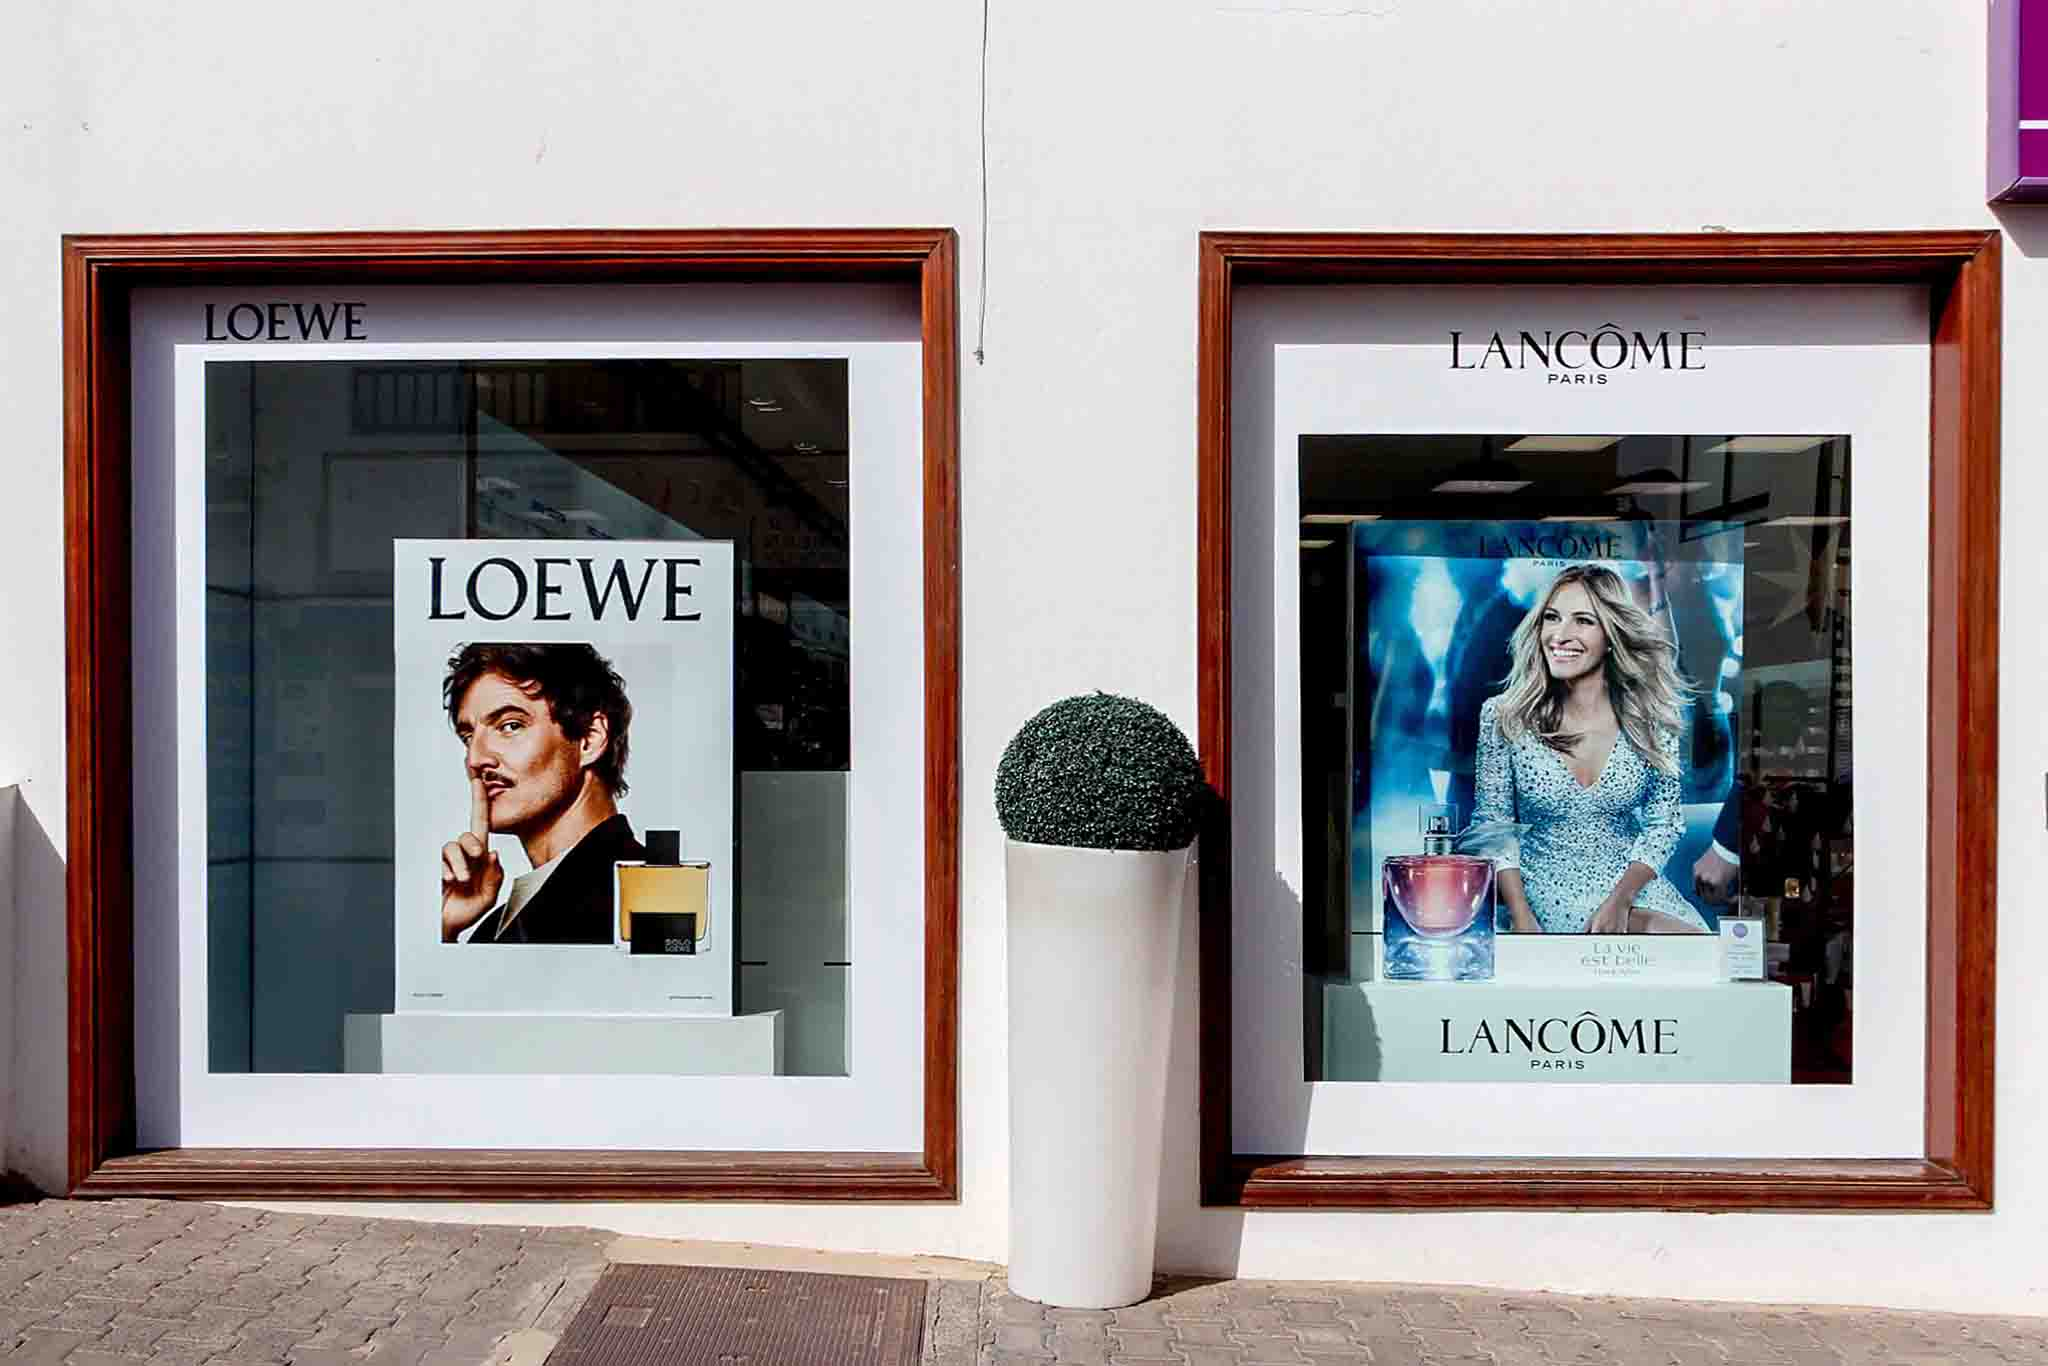 Escaparate Loewe (narcos) y Lamcome (J.Robert)  madera